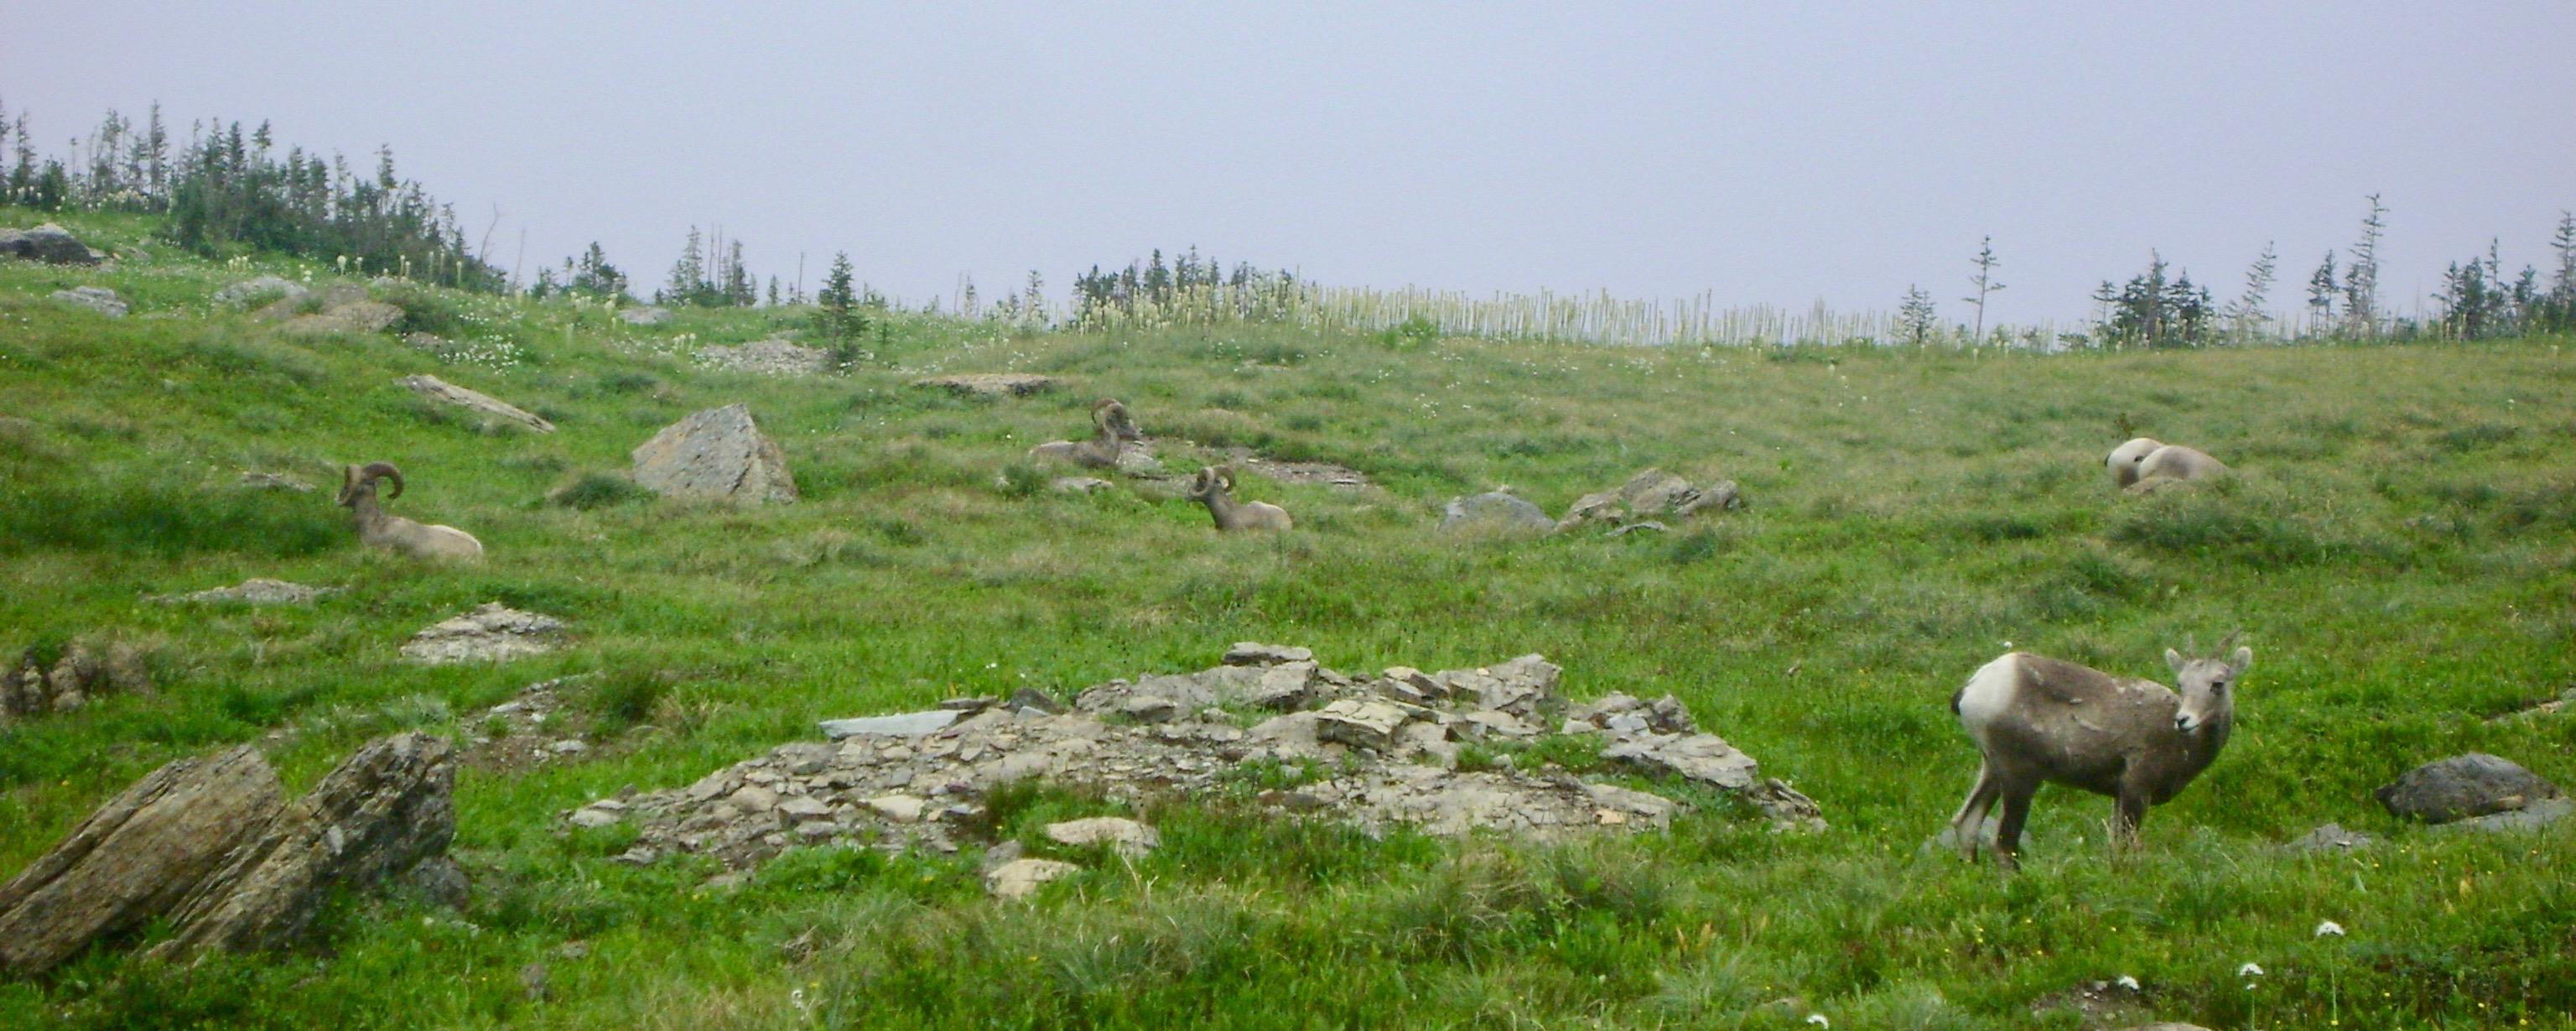 Mountain Sheep beside the Highline Loop Trail